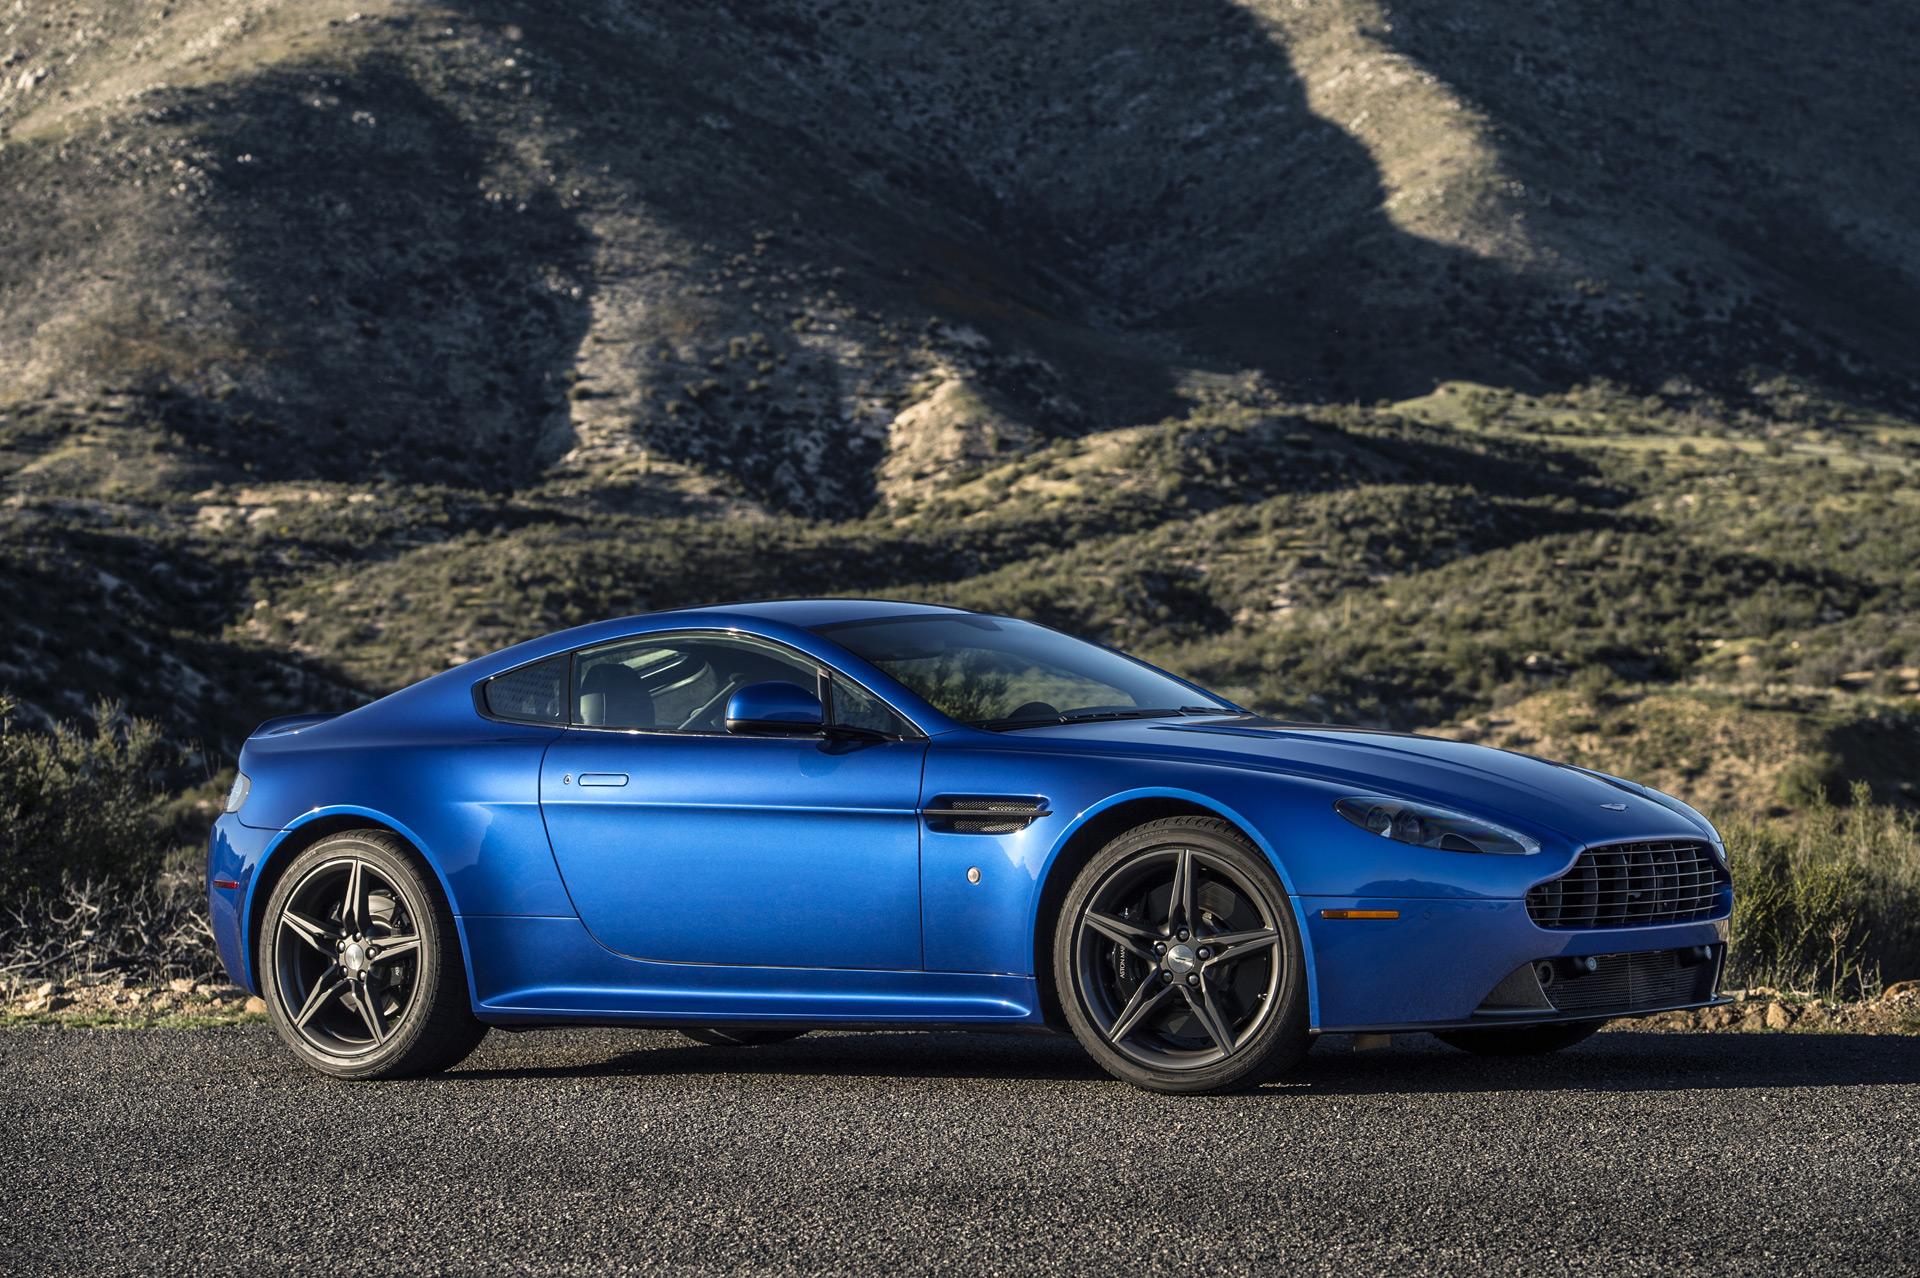 2017 Aston Martin Vantage Priced From 137 820